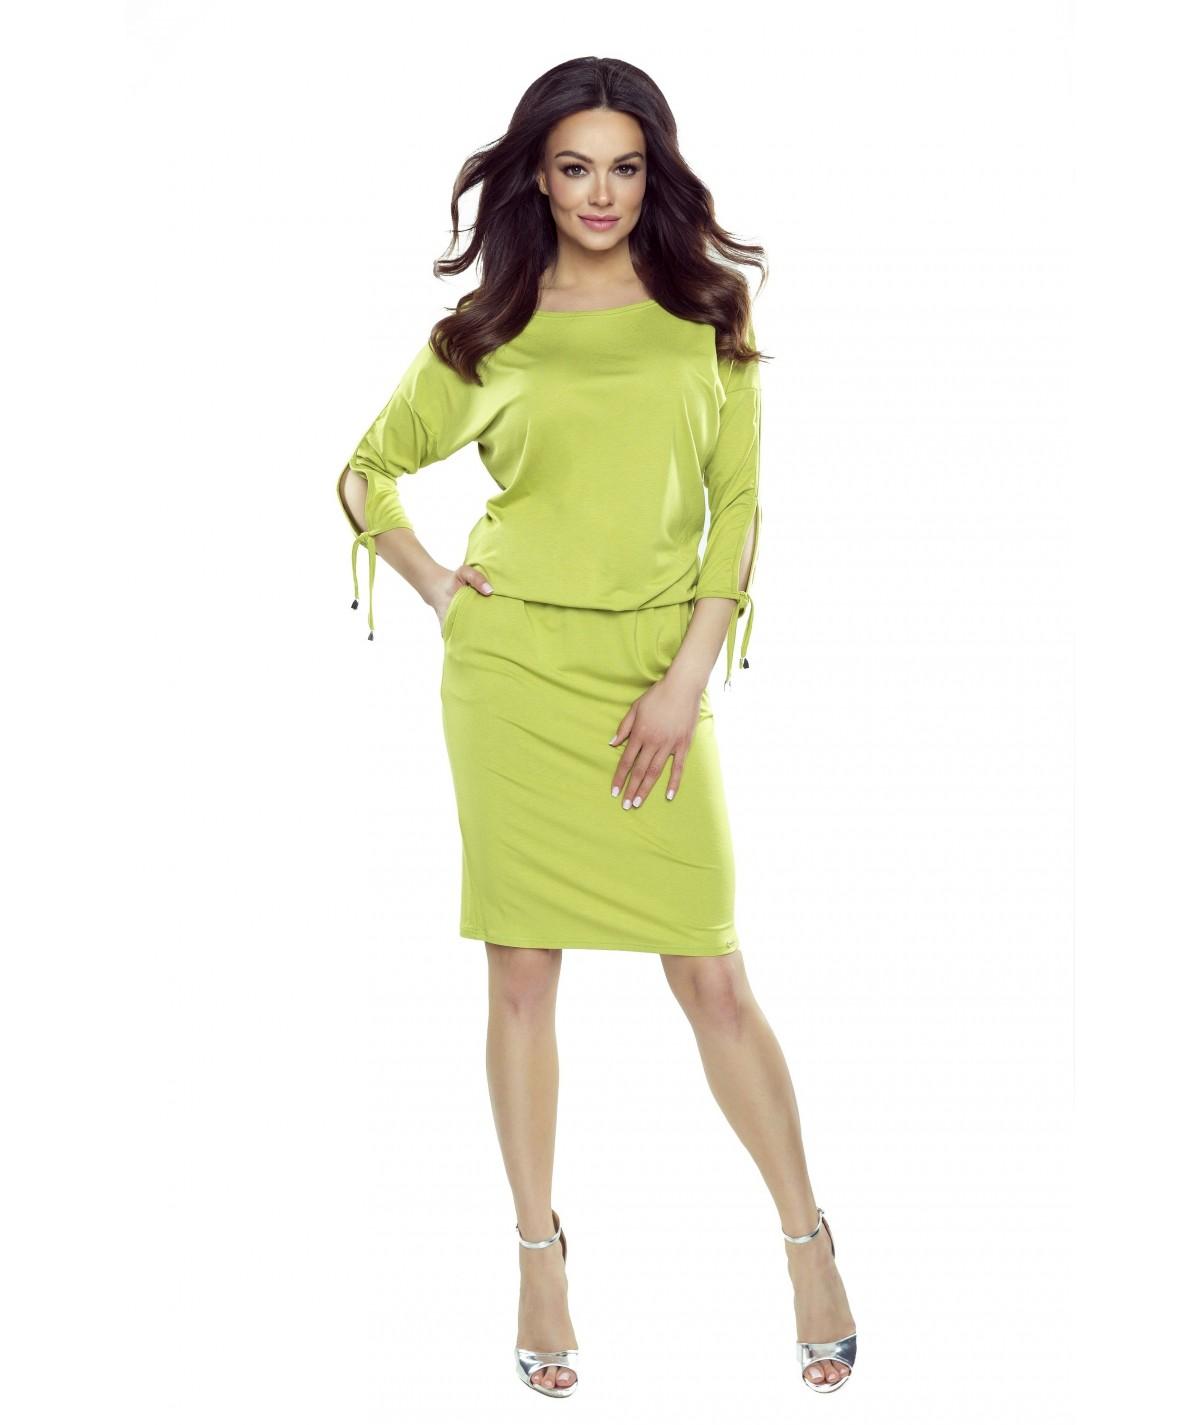 Limonkowa sukienka dzienna venus - bergamo